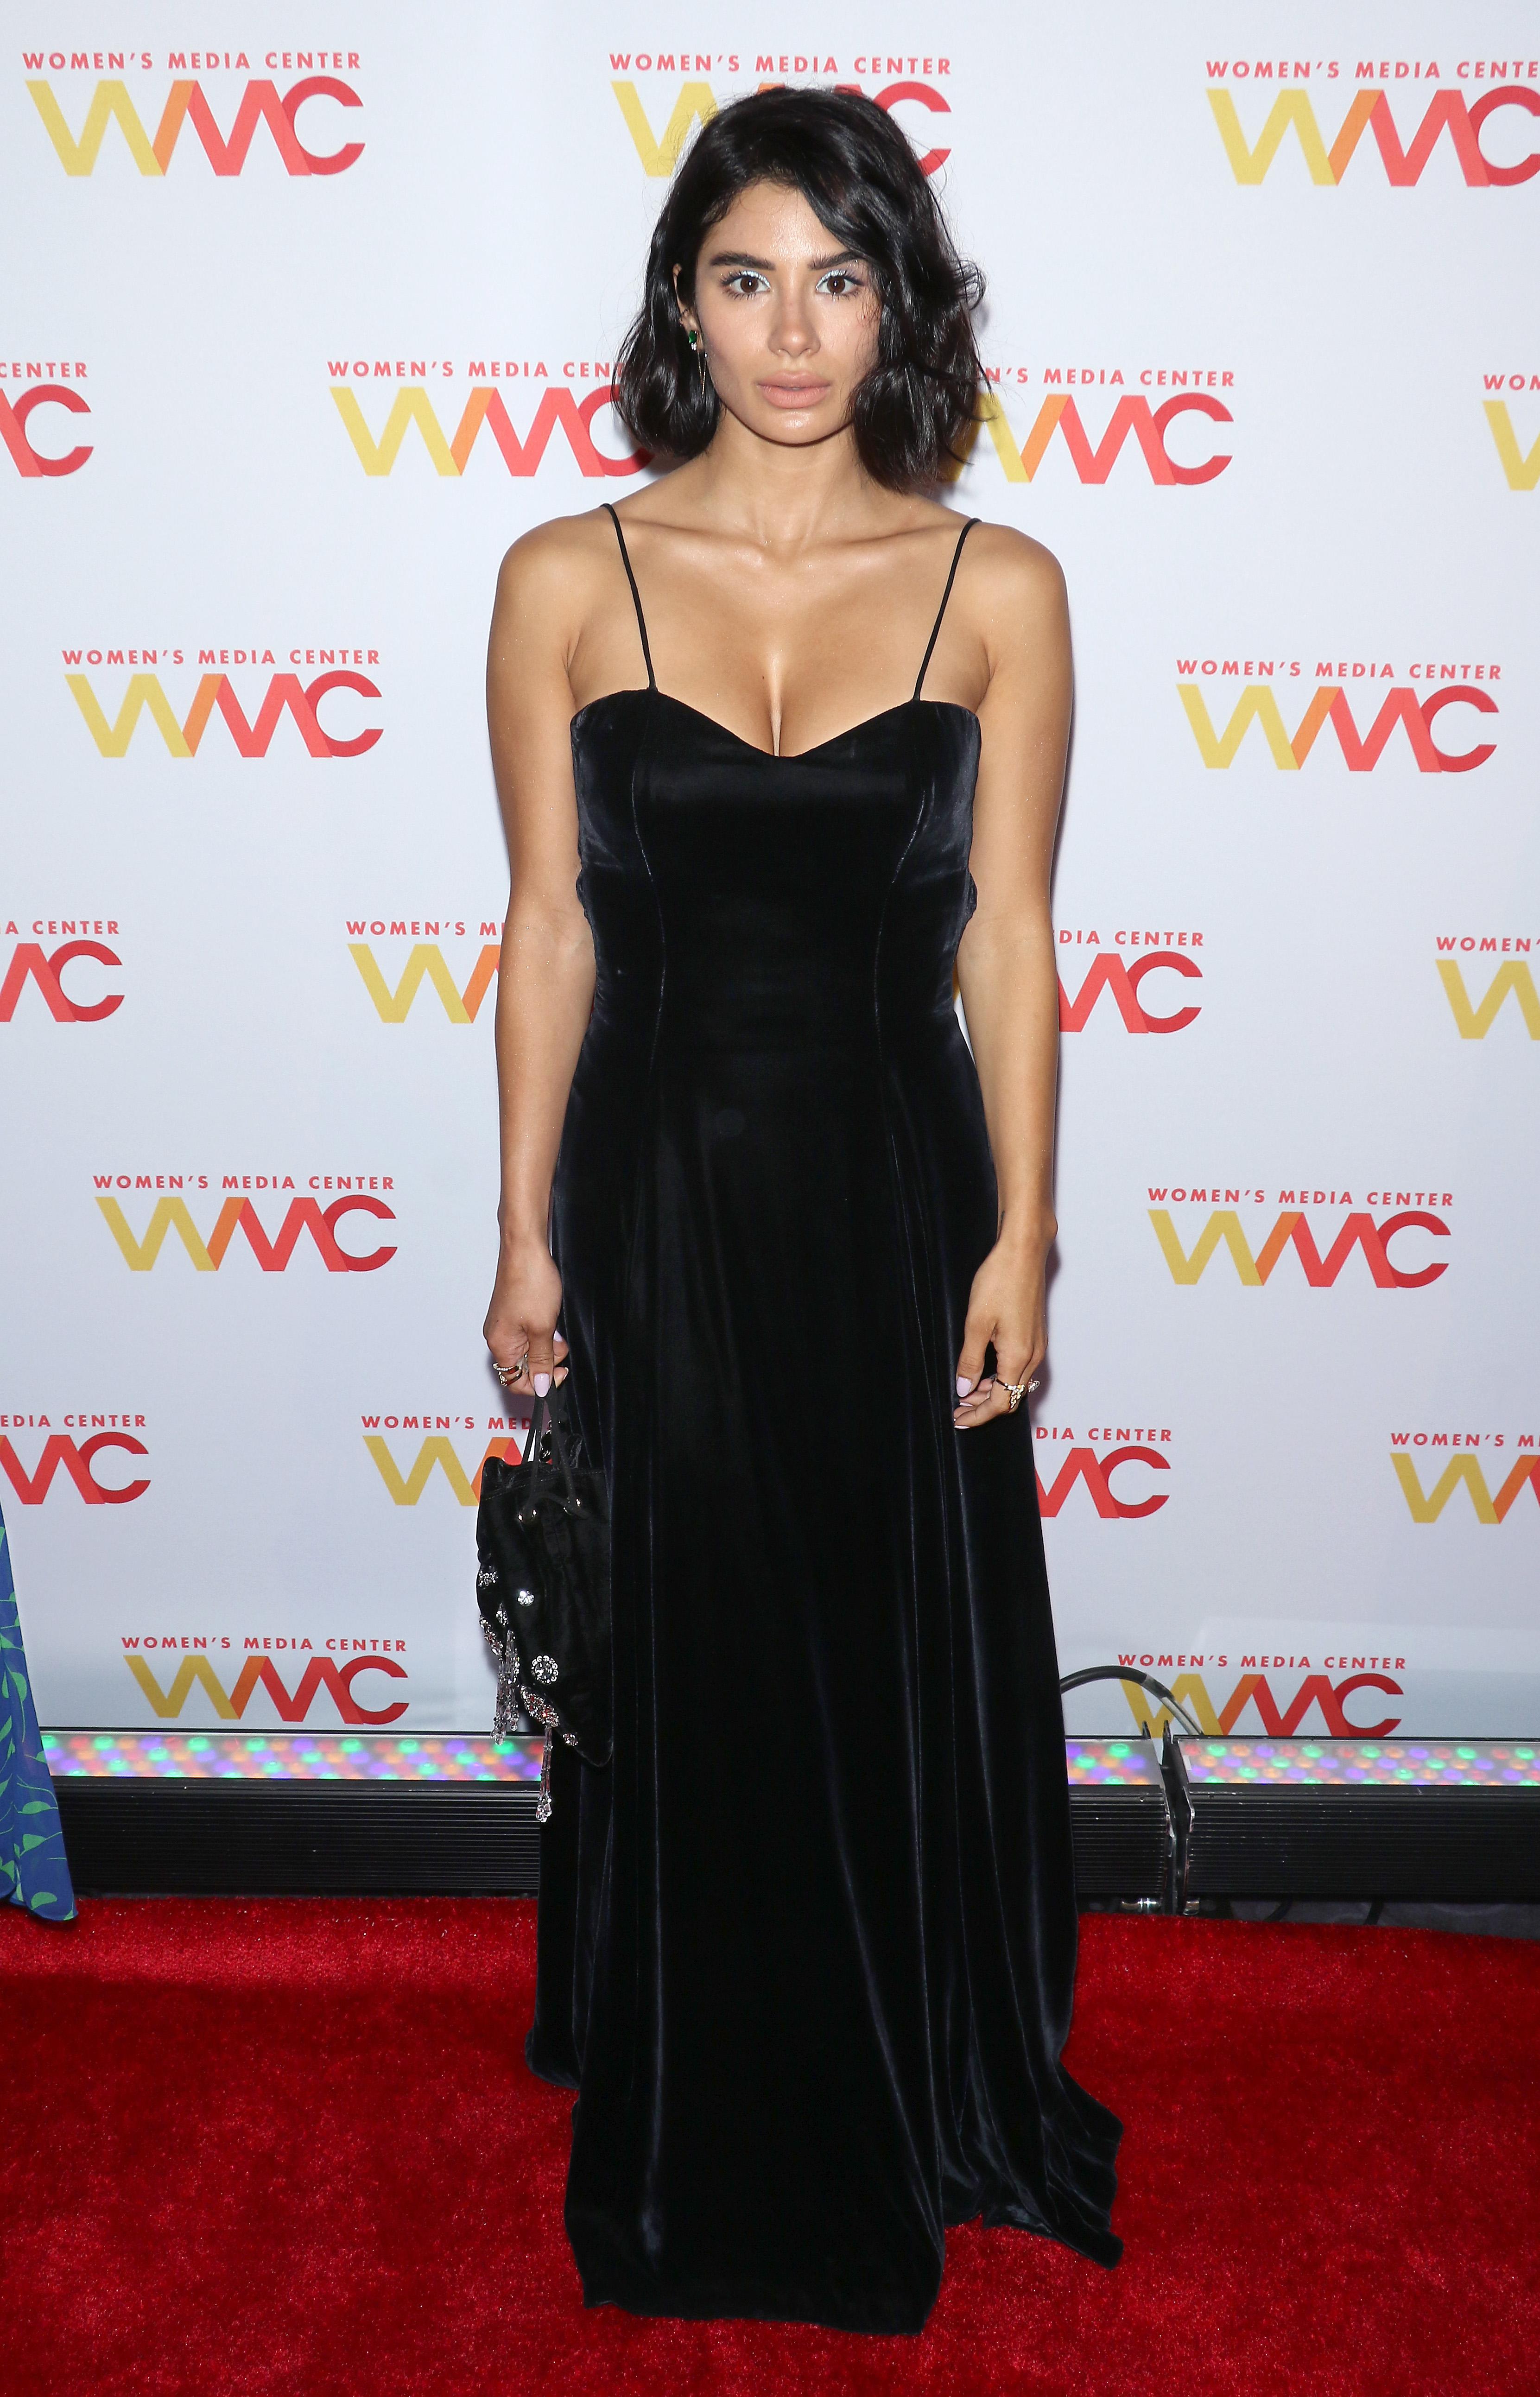 Diane Guerrero, looks